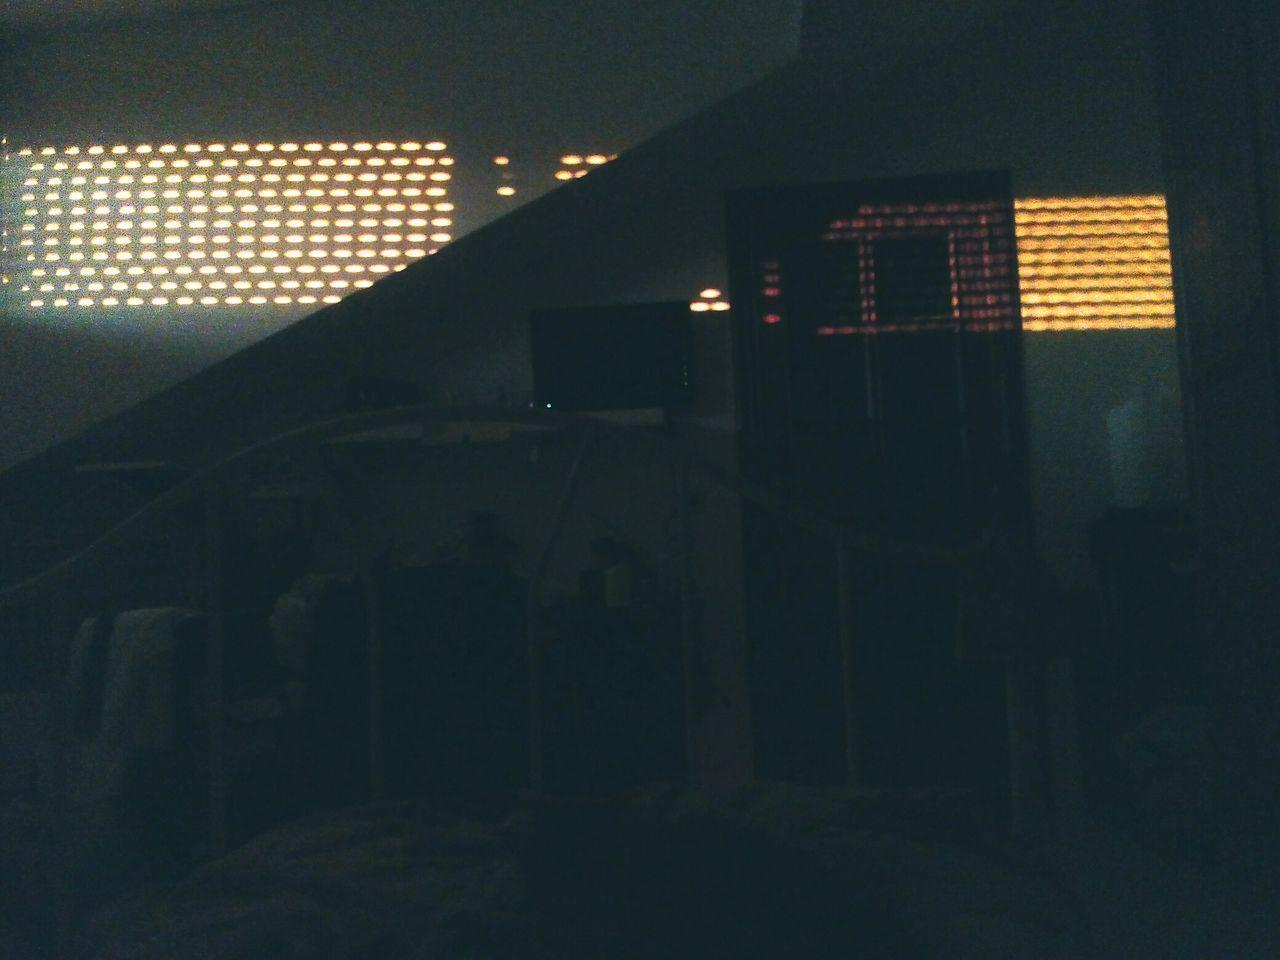 architecture, built structure, no people, illuminated, night, building exterior, indoors